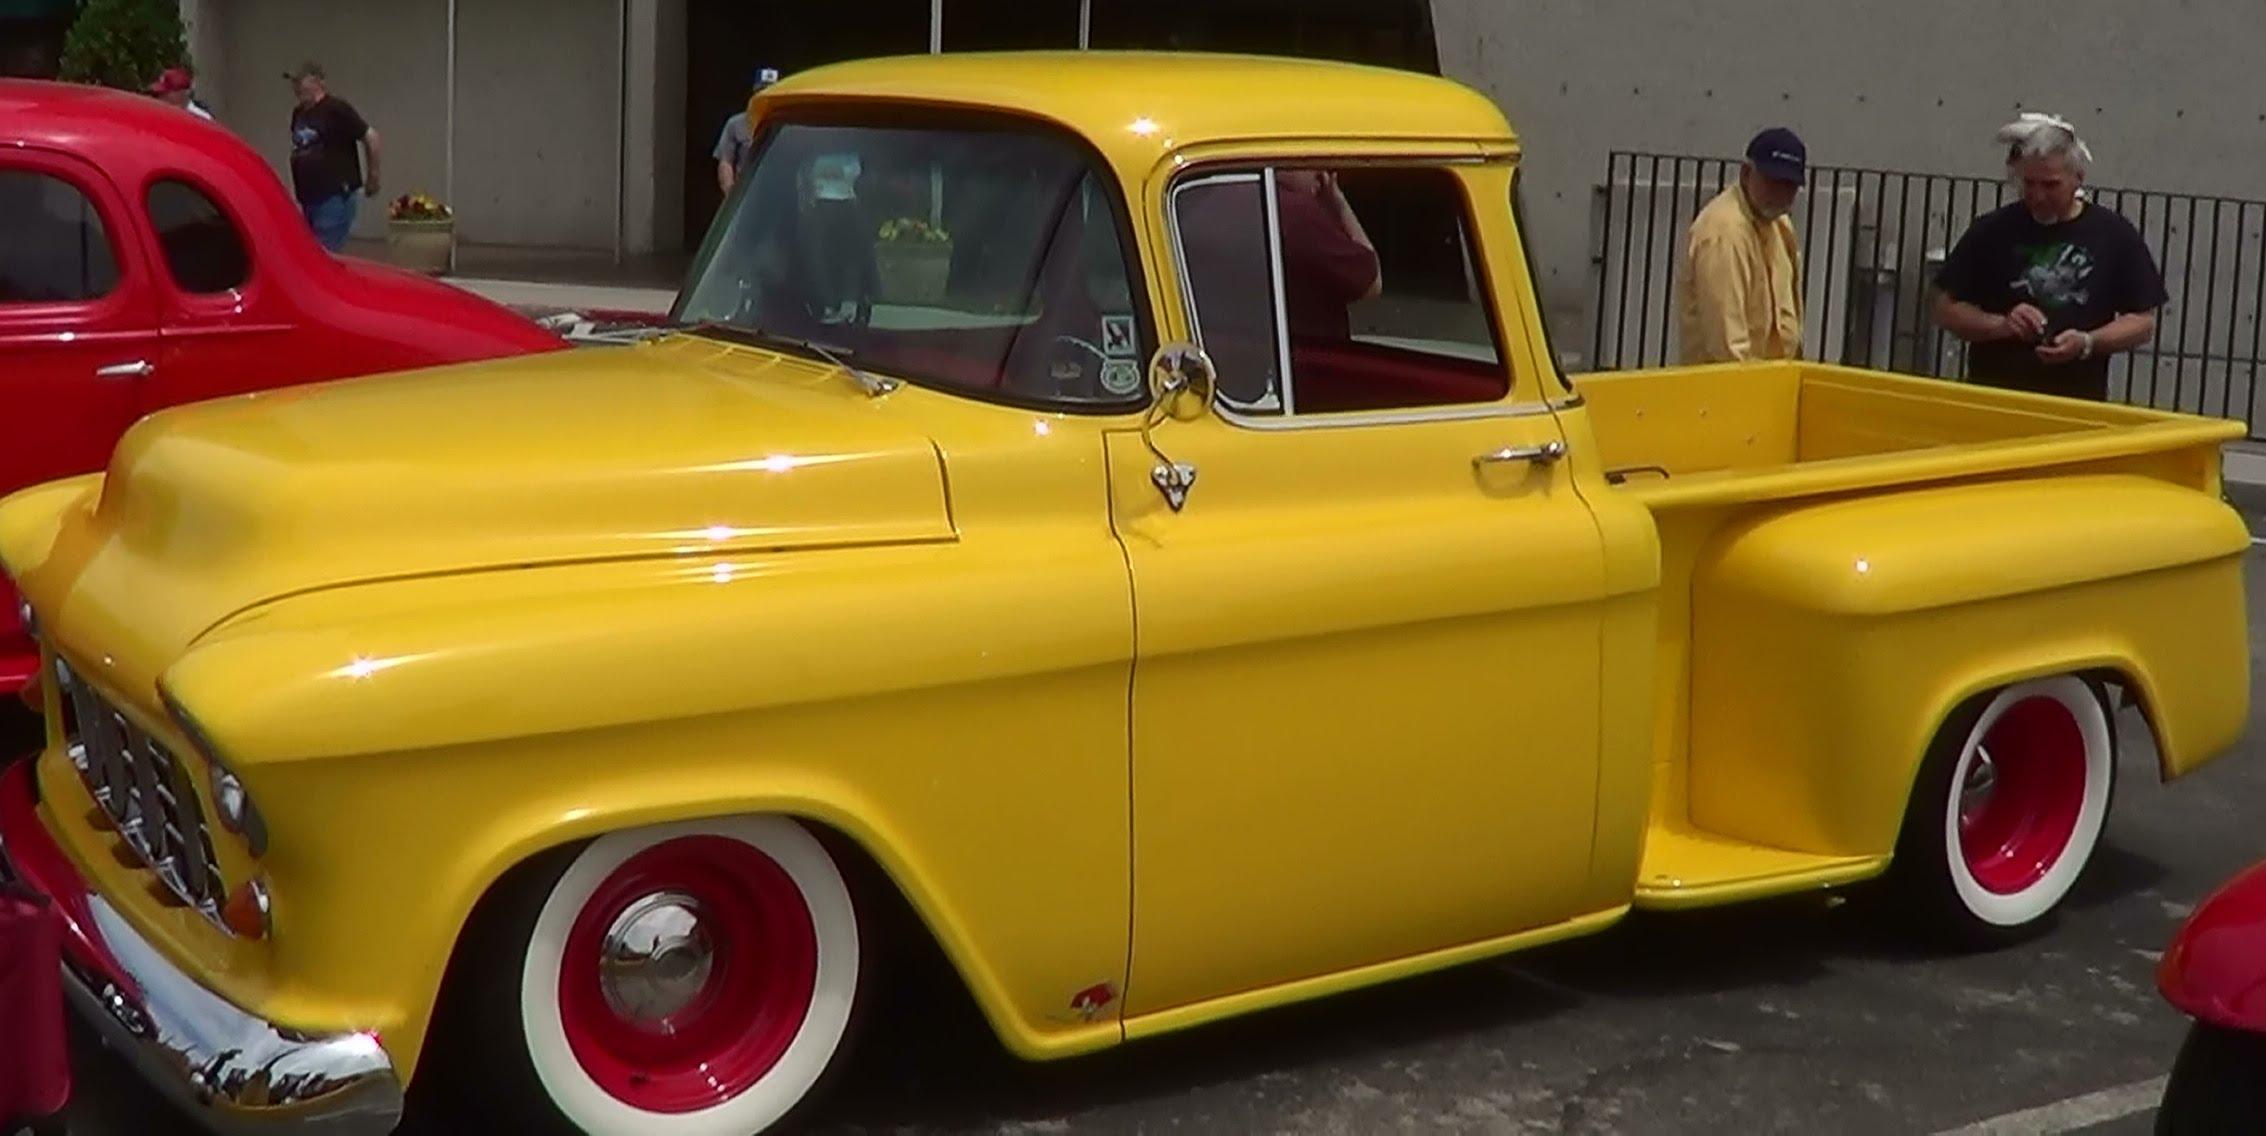 1955 Chevrolet Street Rod Pick Up Scottiedtv Coolest Cars On The Web